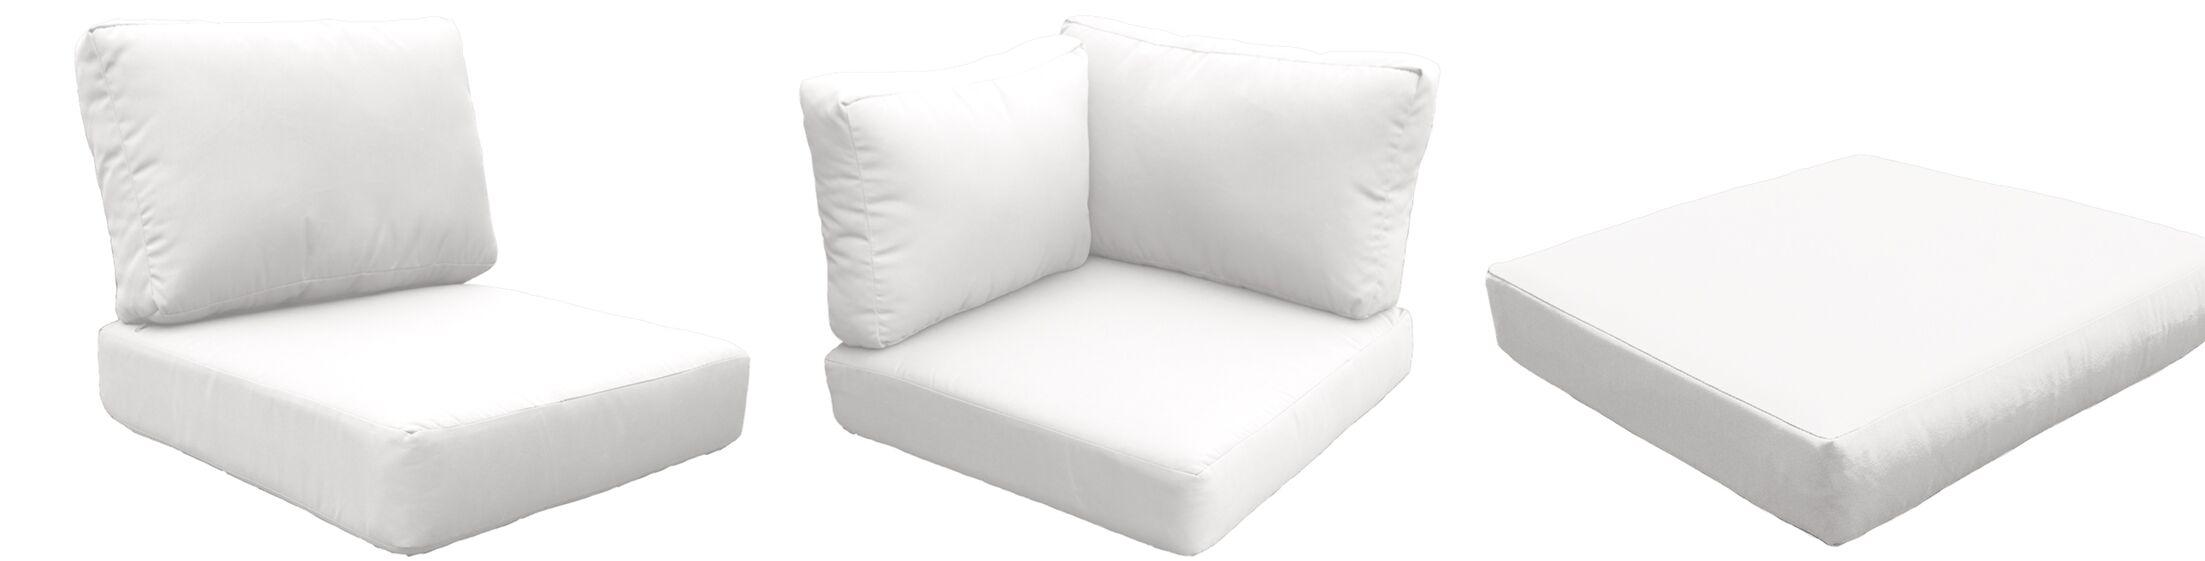 Fairmont 12 Piece Outdoor�Lounge Chair Cushion Set Fabric: White